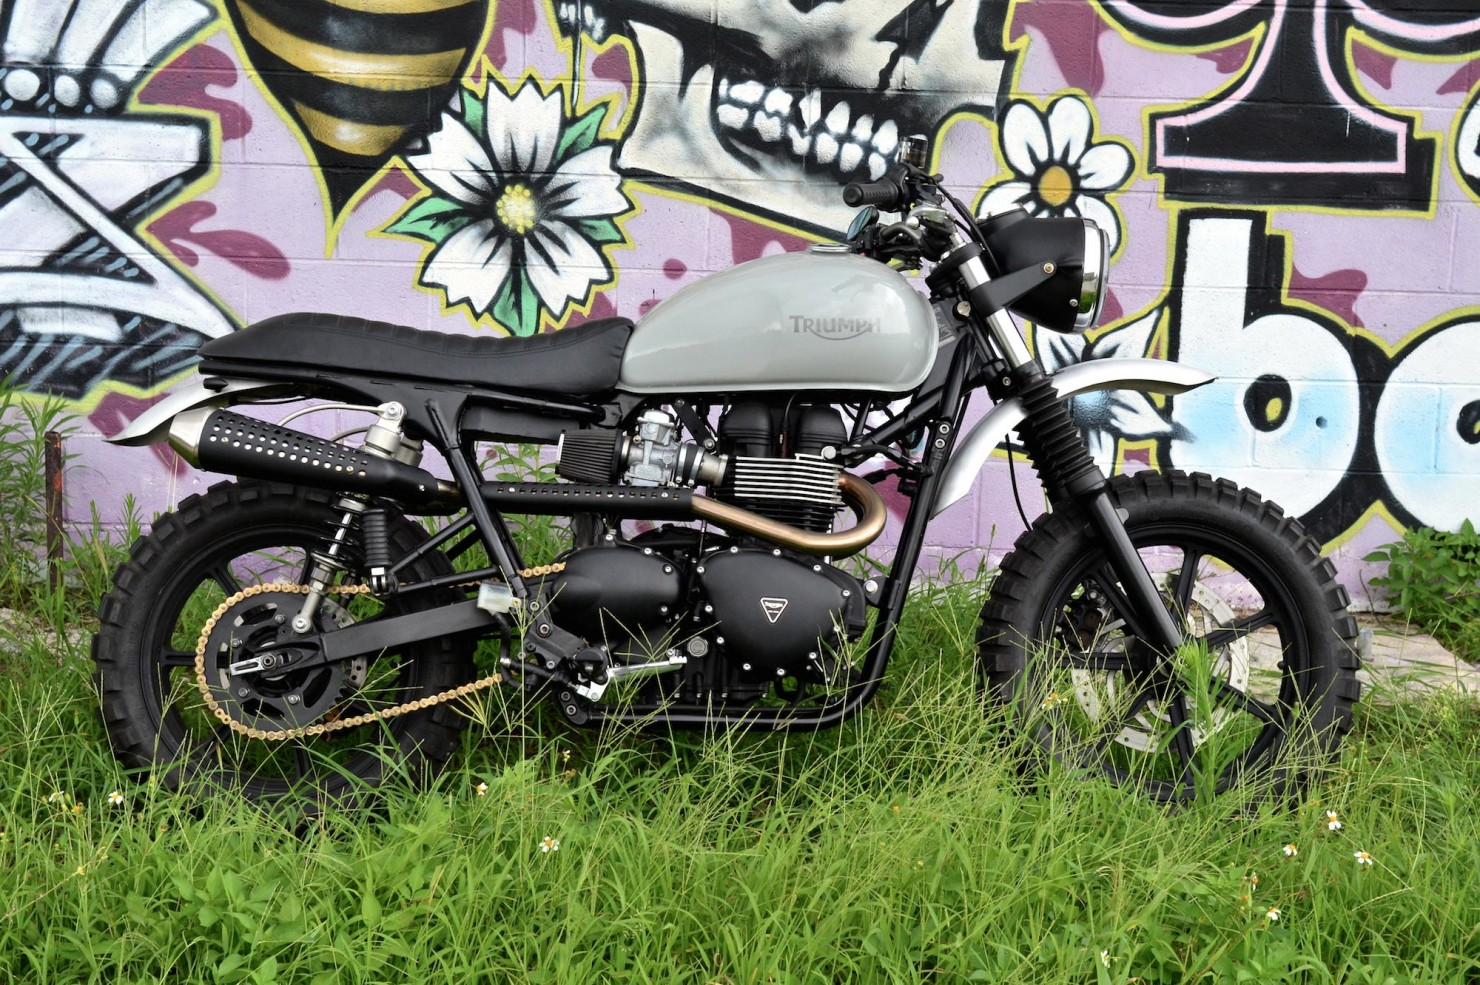 Triumph Scrambler Motorcycle 9